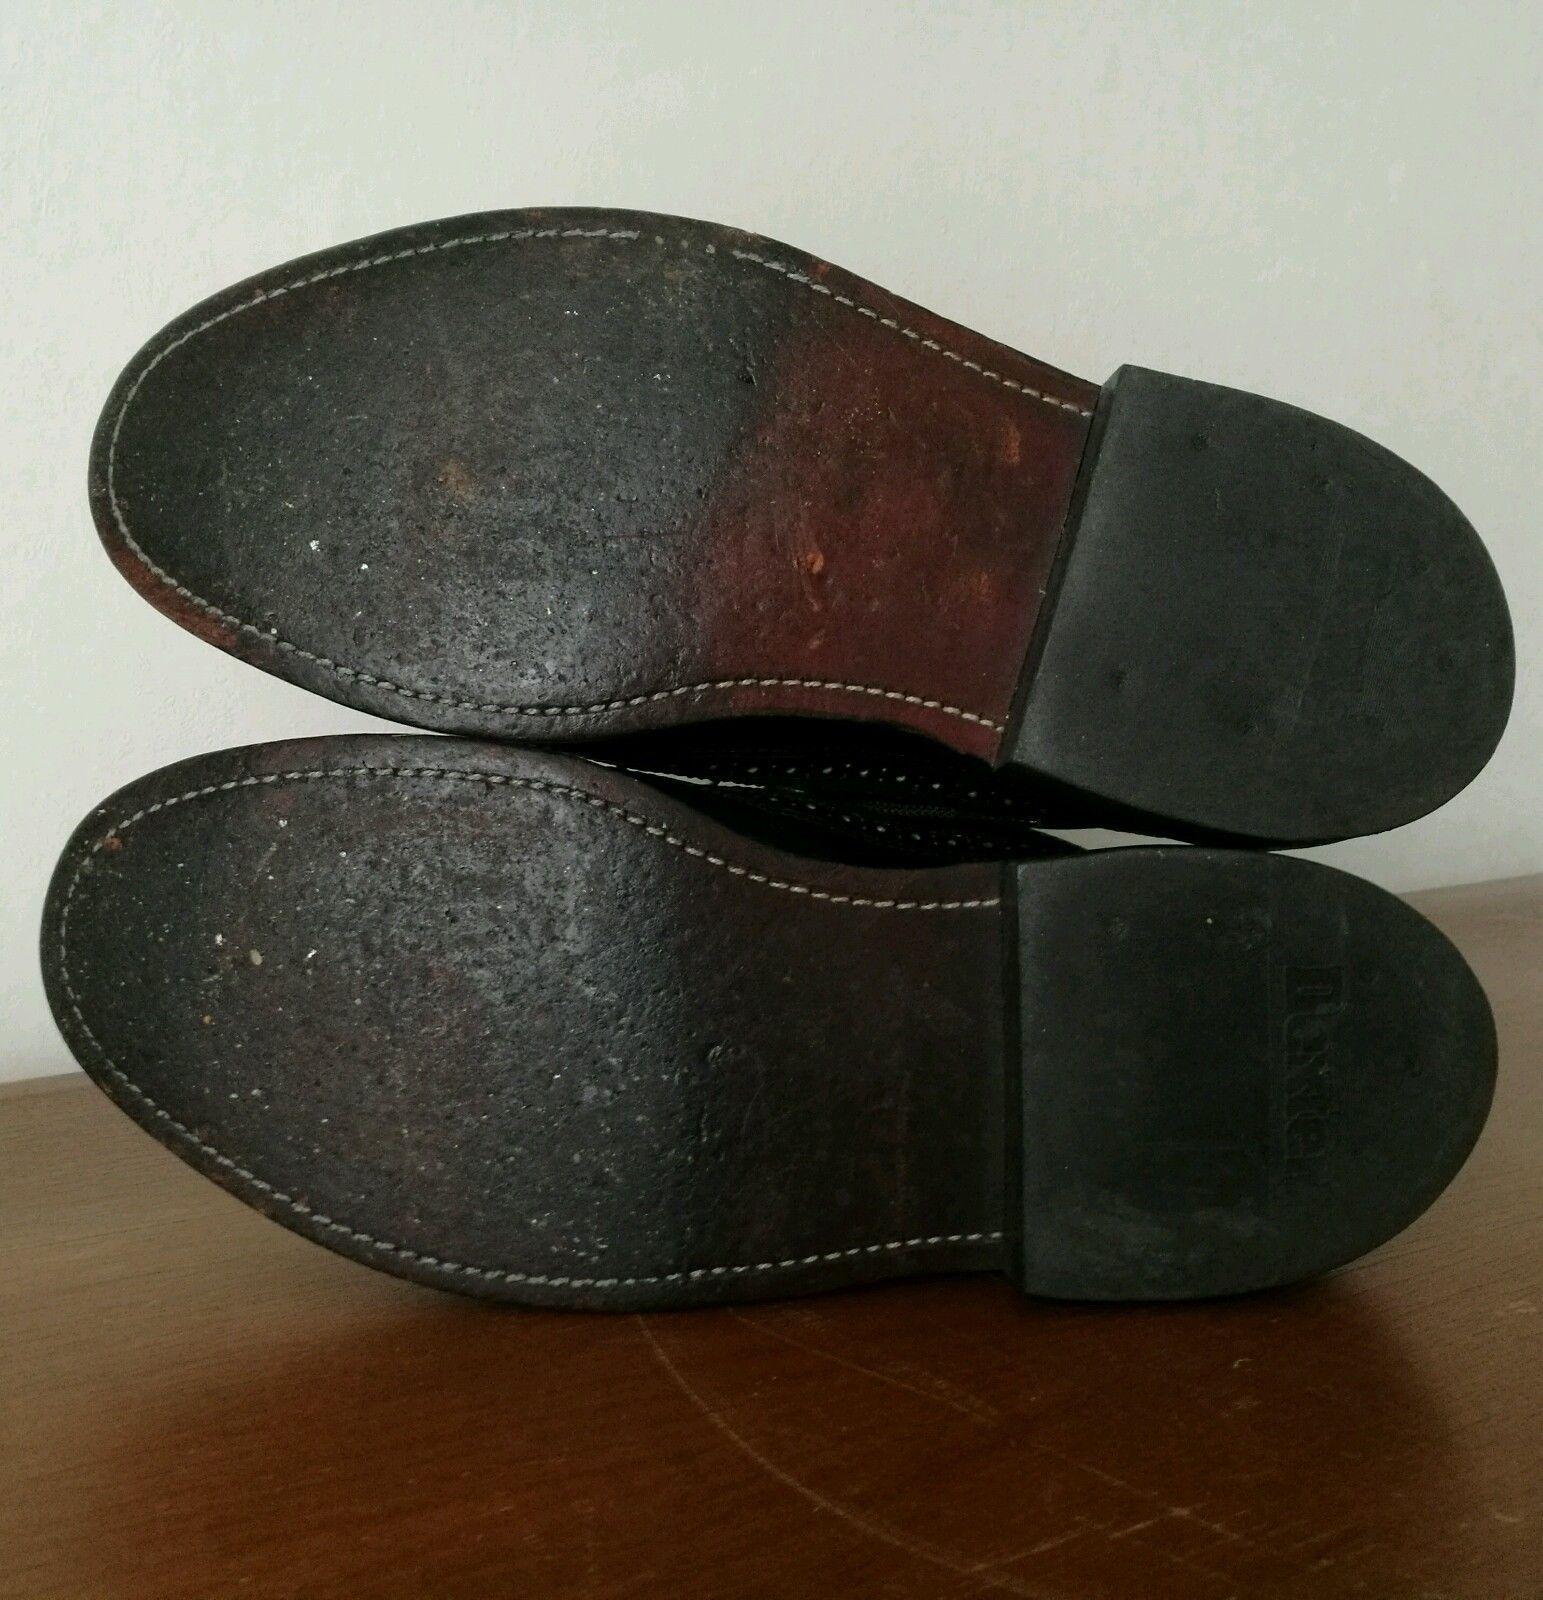 Vintage Dexter Leather Wingtip Brogues Oxford Shoes Men's 7.5 D Black USA Made